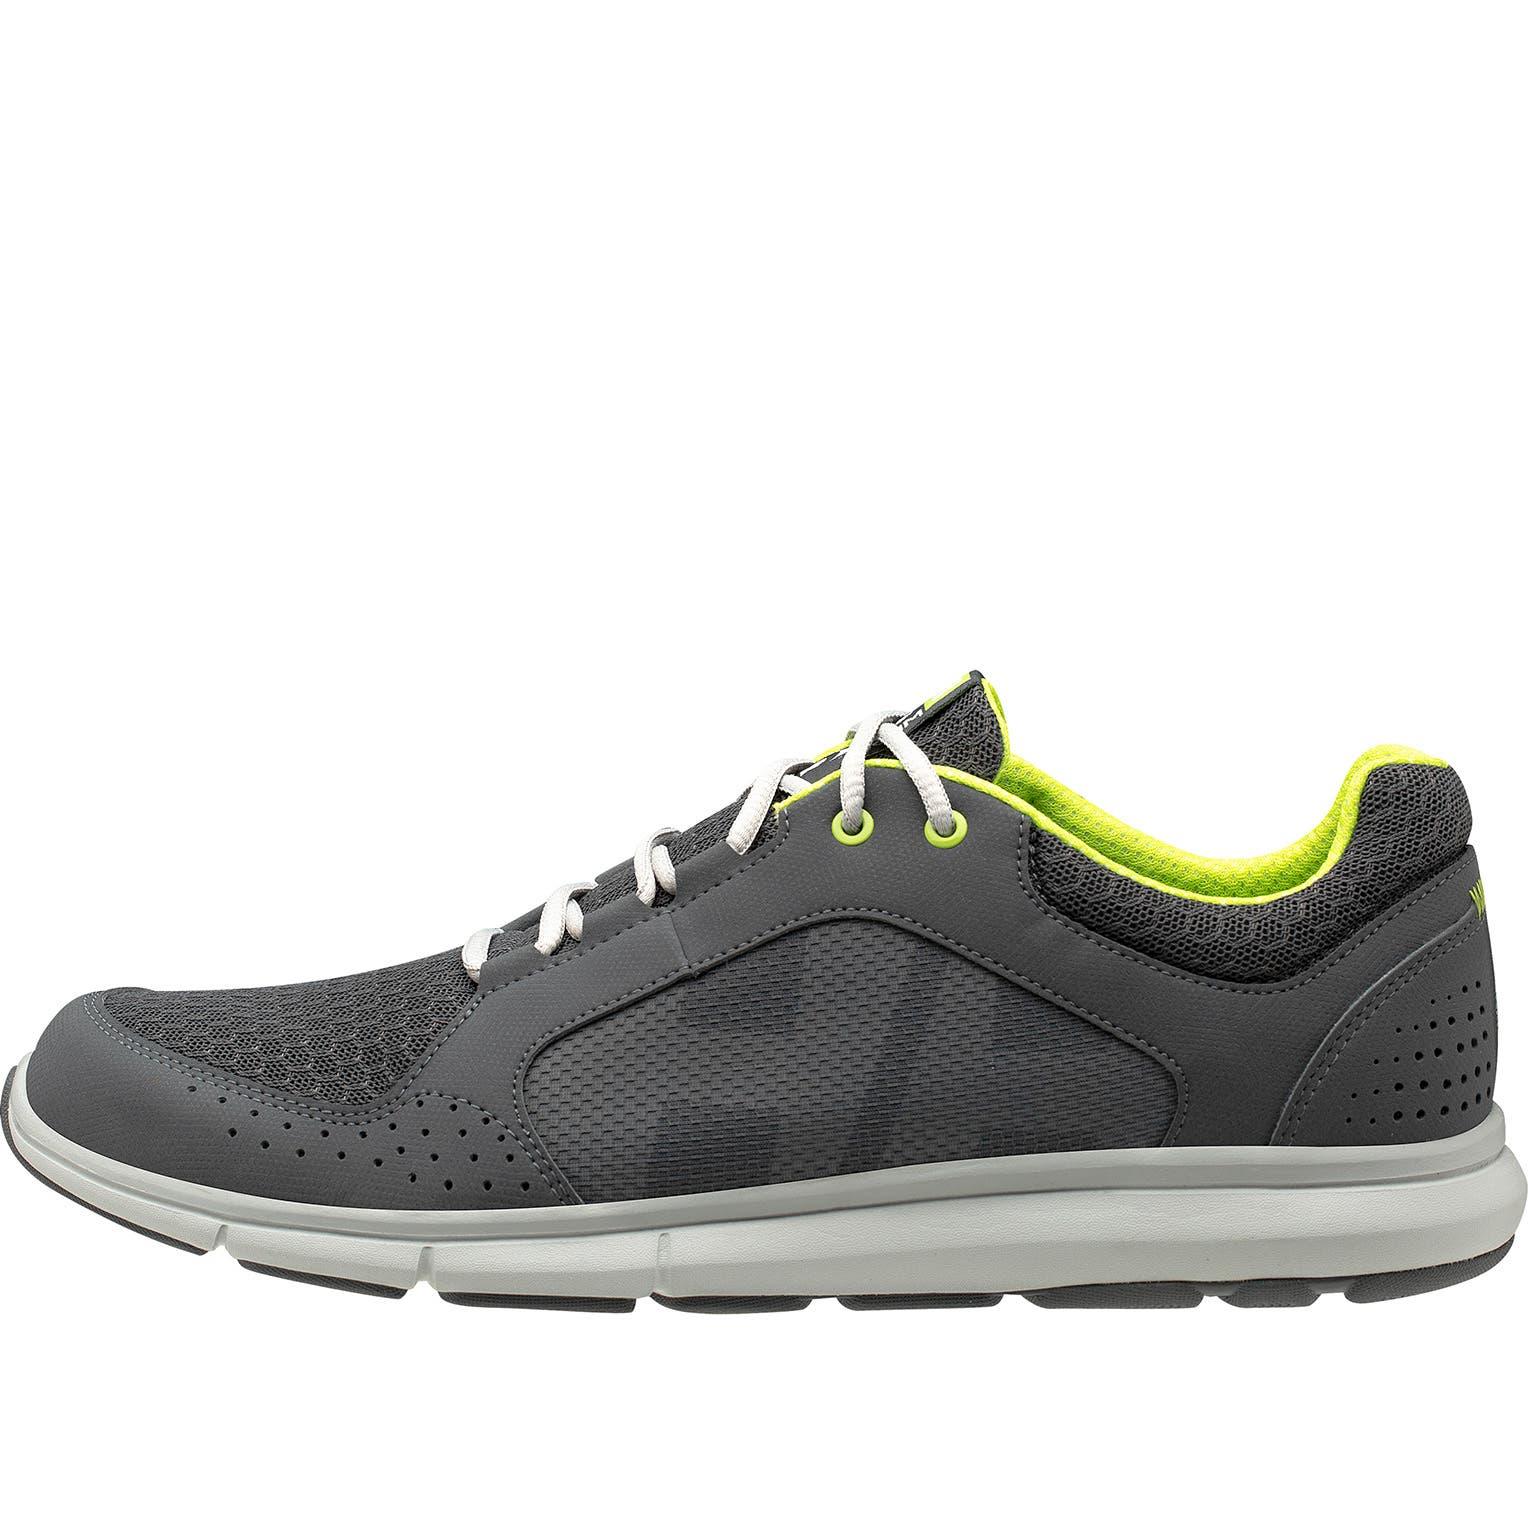 Helly Hansen Men's Ahiga V4 Hydropower Lightweight Deck Sneakers (11582)